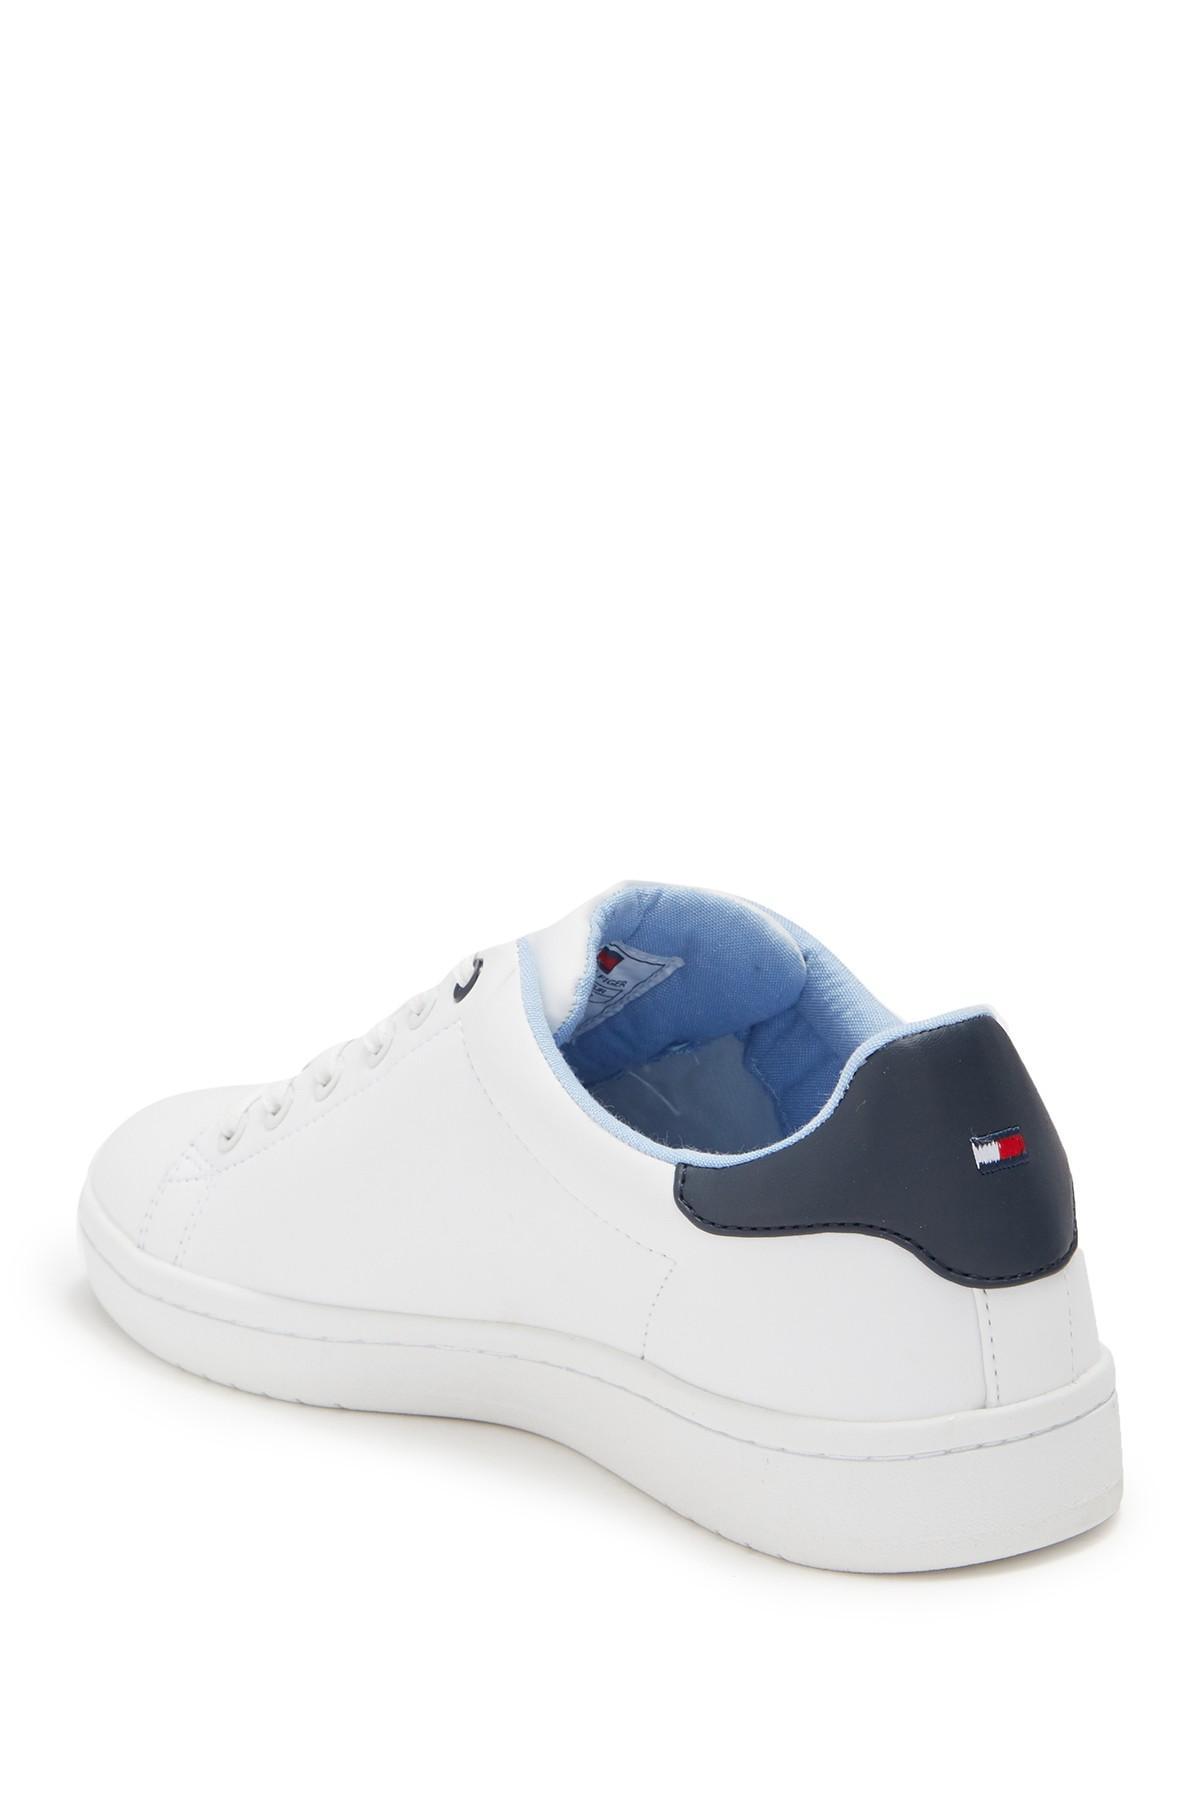 Tommy Hilfiger Loyal Sneaker for Men - Lyst